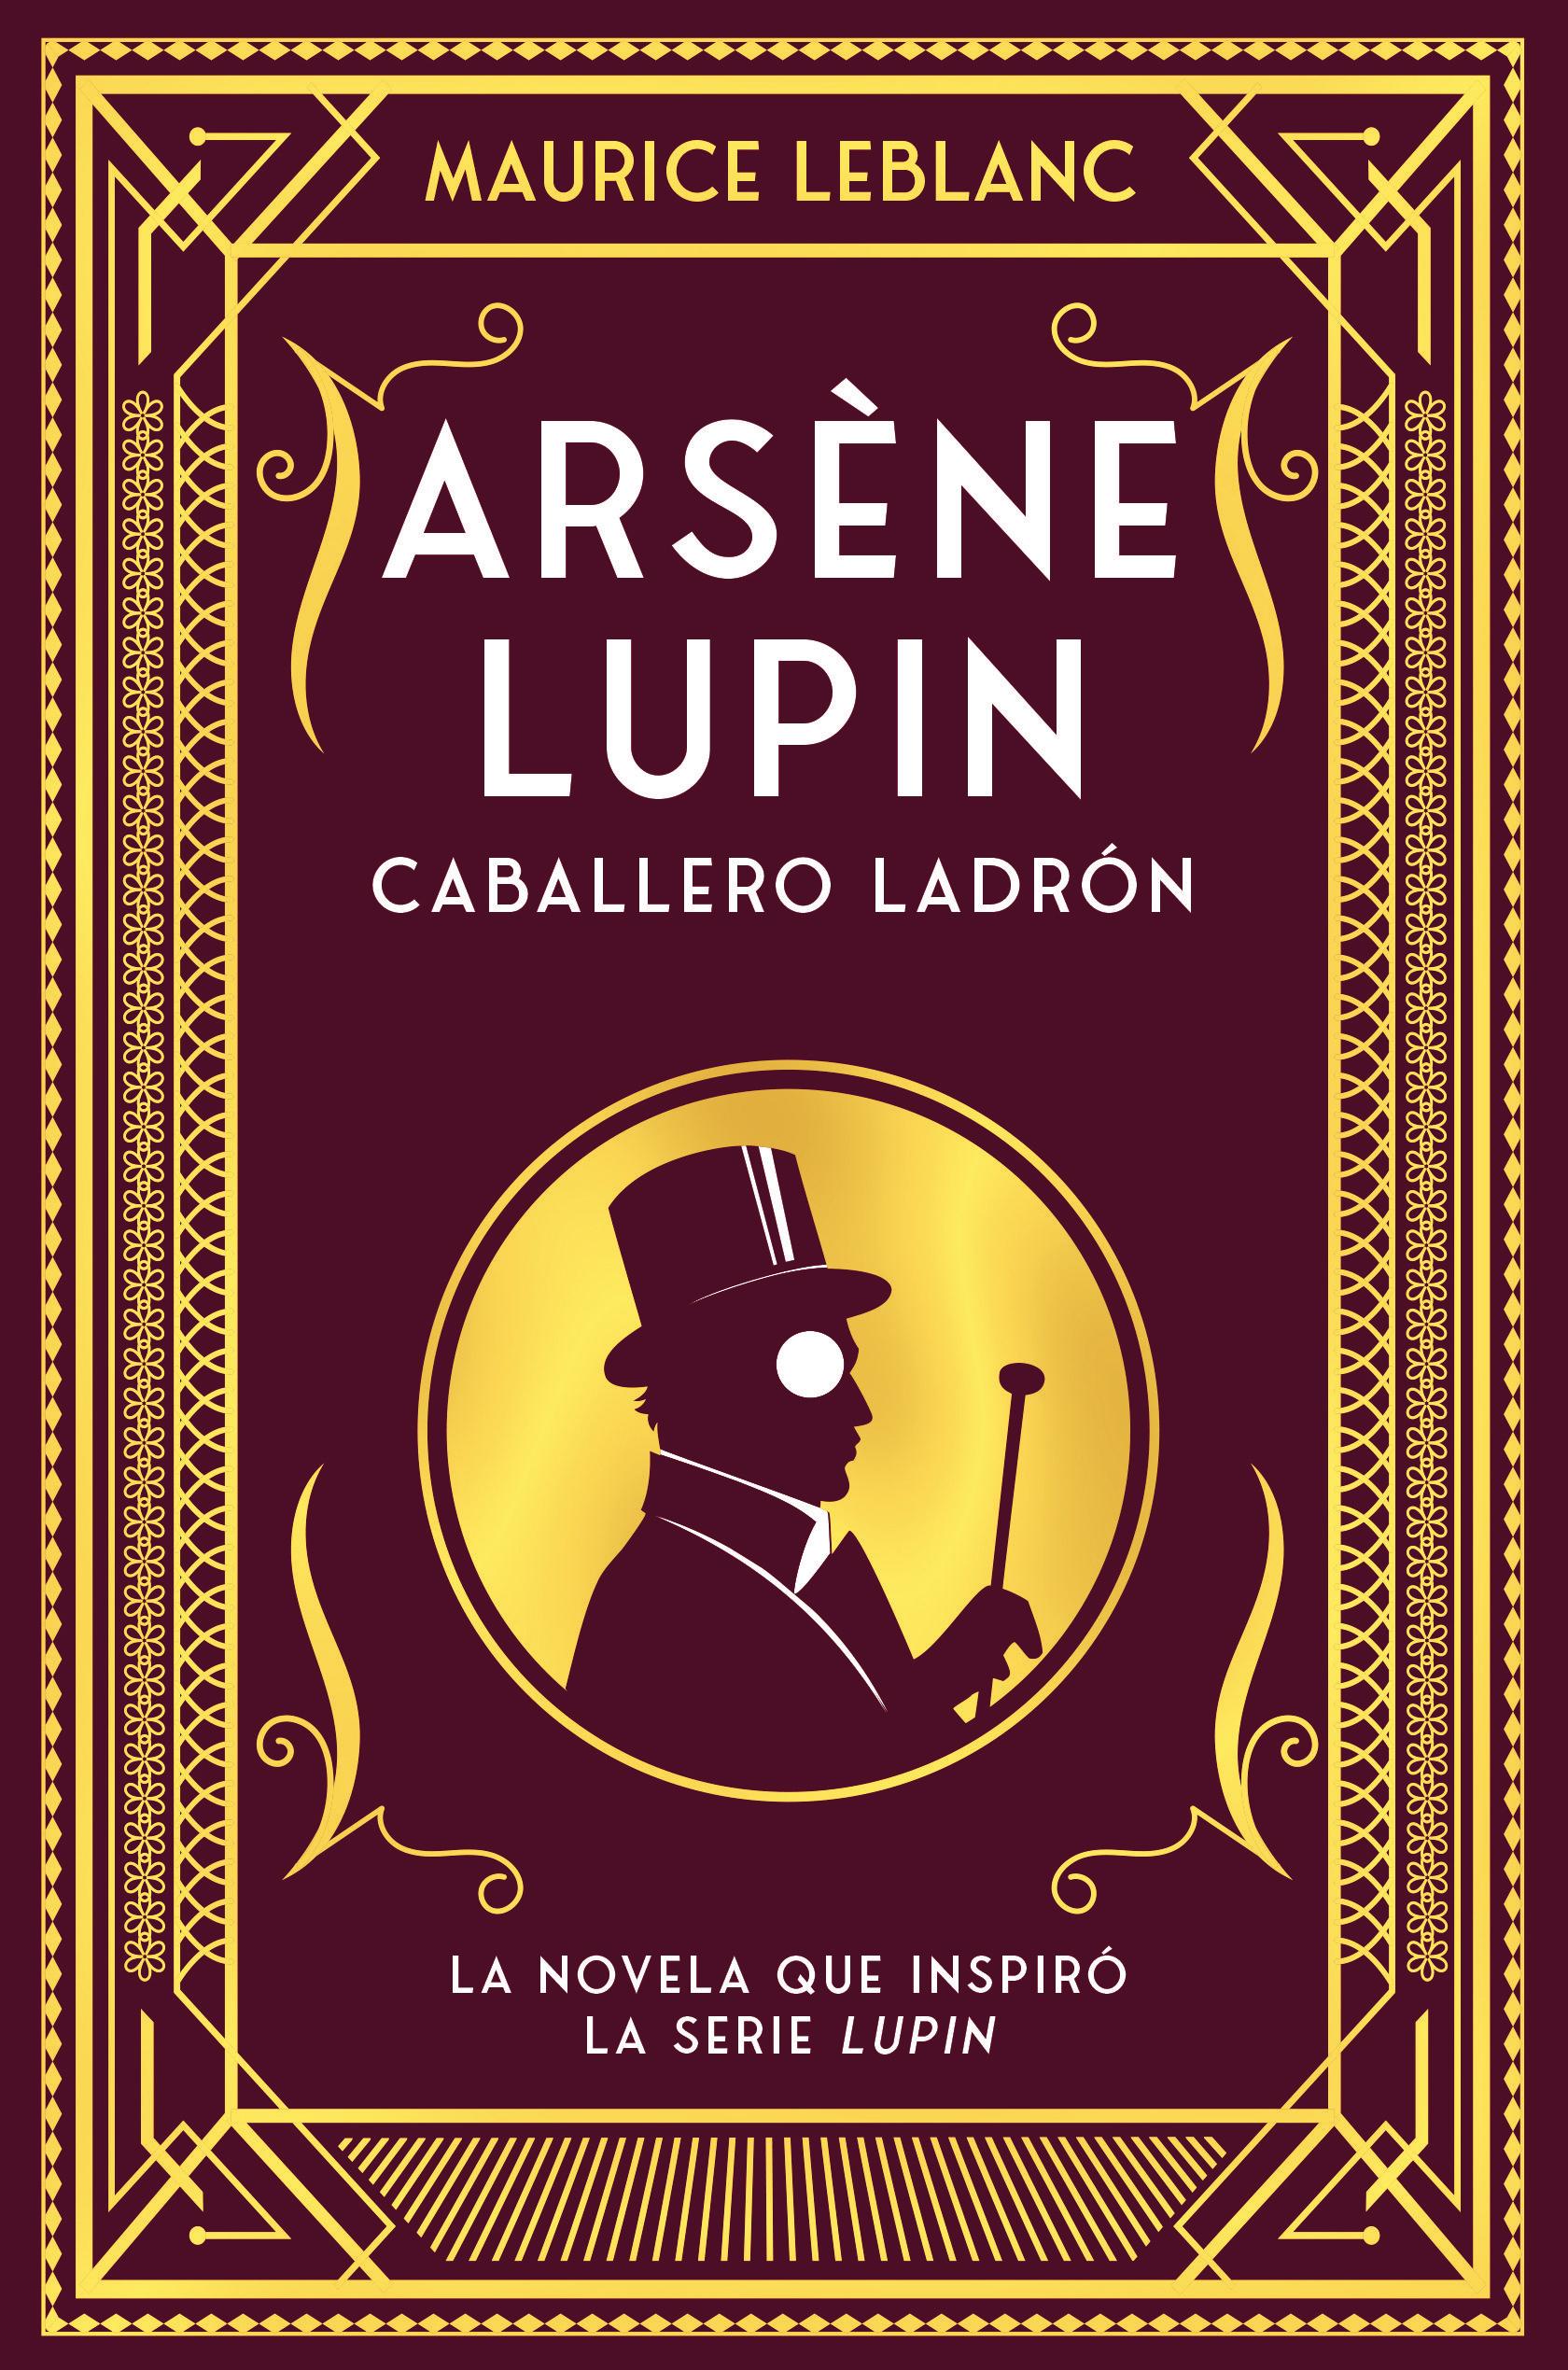 ARSENE LUPIN CABALLERO Y LADRON